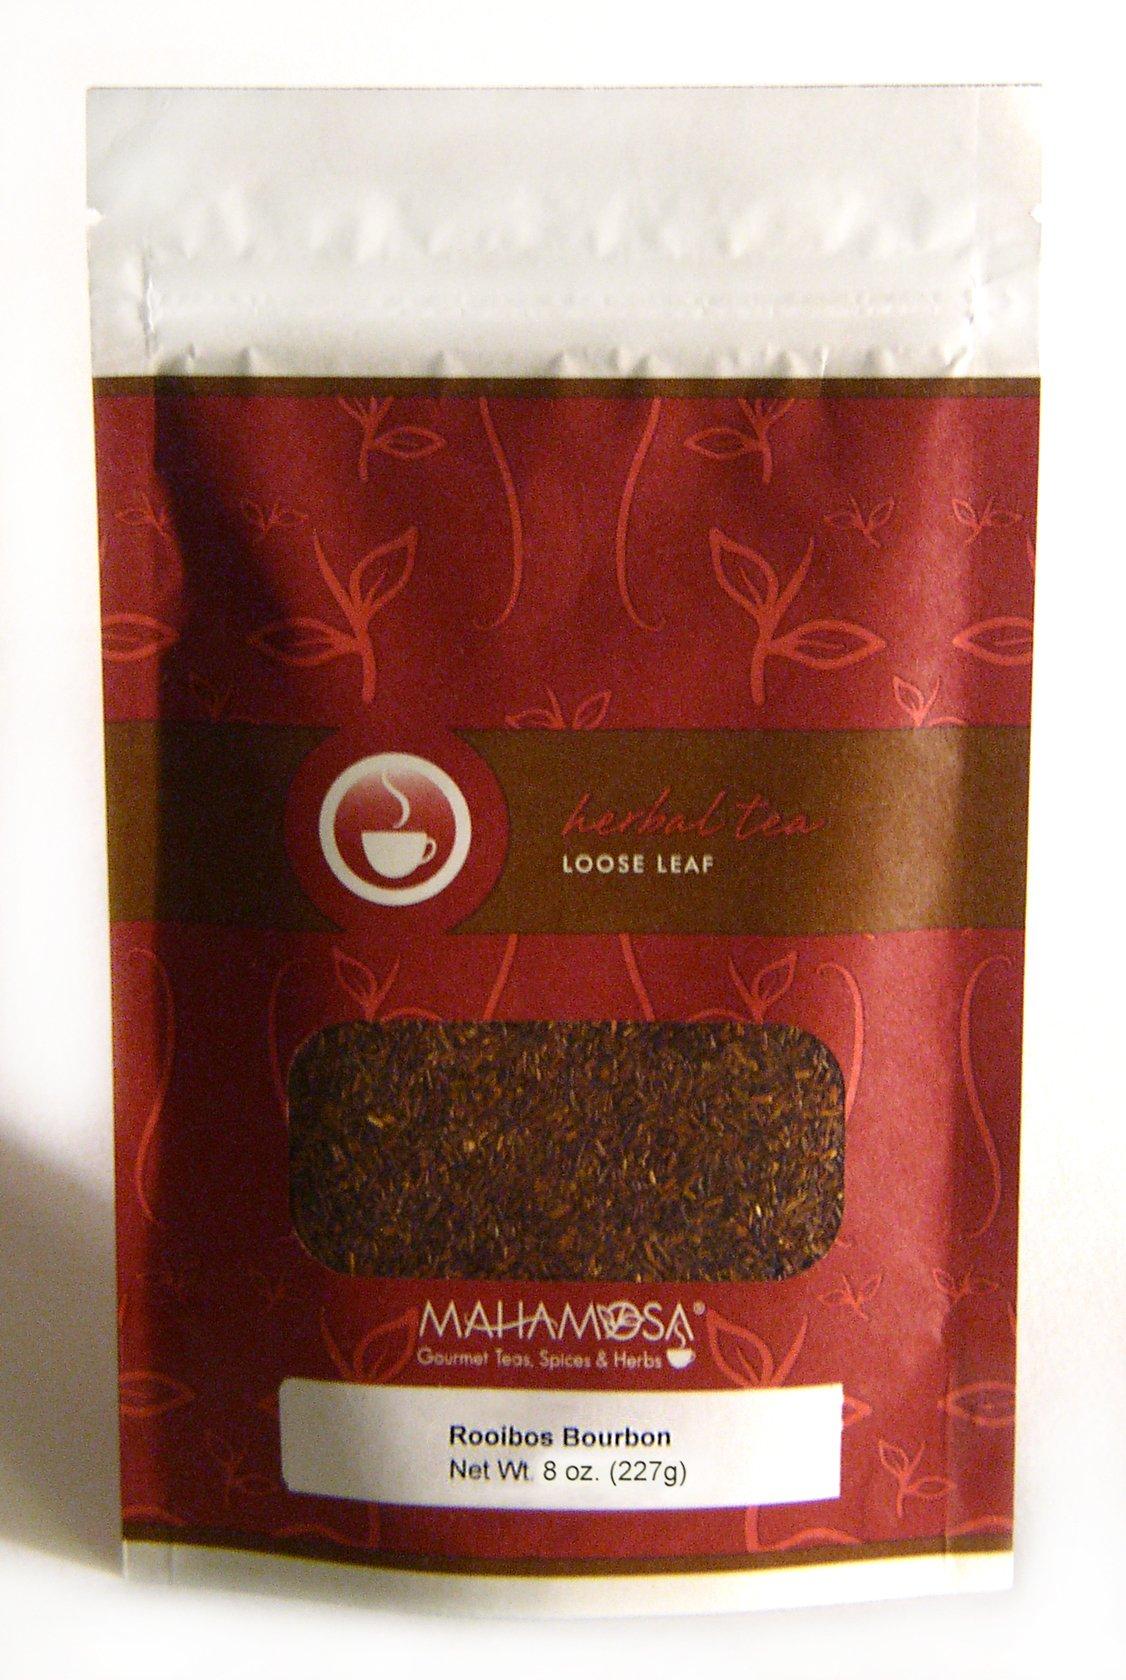 Mahamosa Rooibos Herbal Tea and Tea Infuser Set: 8 oz Rooibos Bourbon Rooibos (Red Bush) Tea, 1 Stainless Steel Tea Ball Infuser (Bundle- 2 items)(Tea ingredients: Rooibos and vanilla flavor)